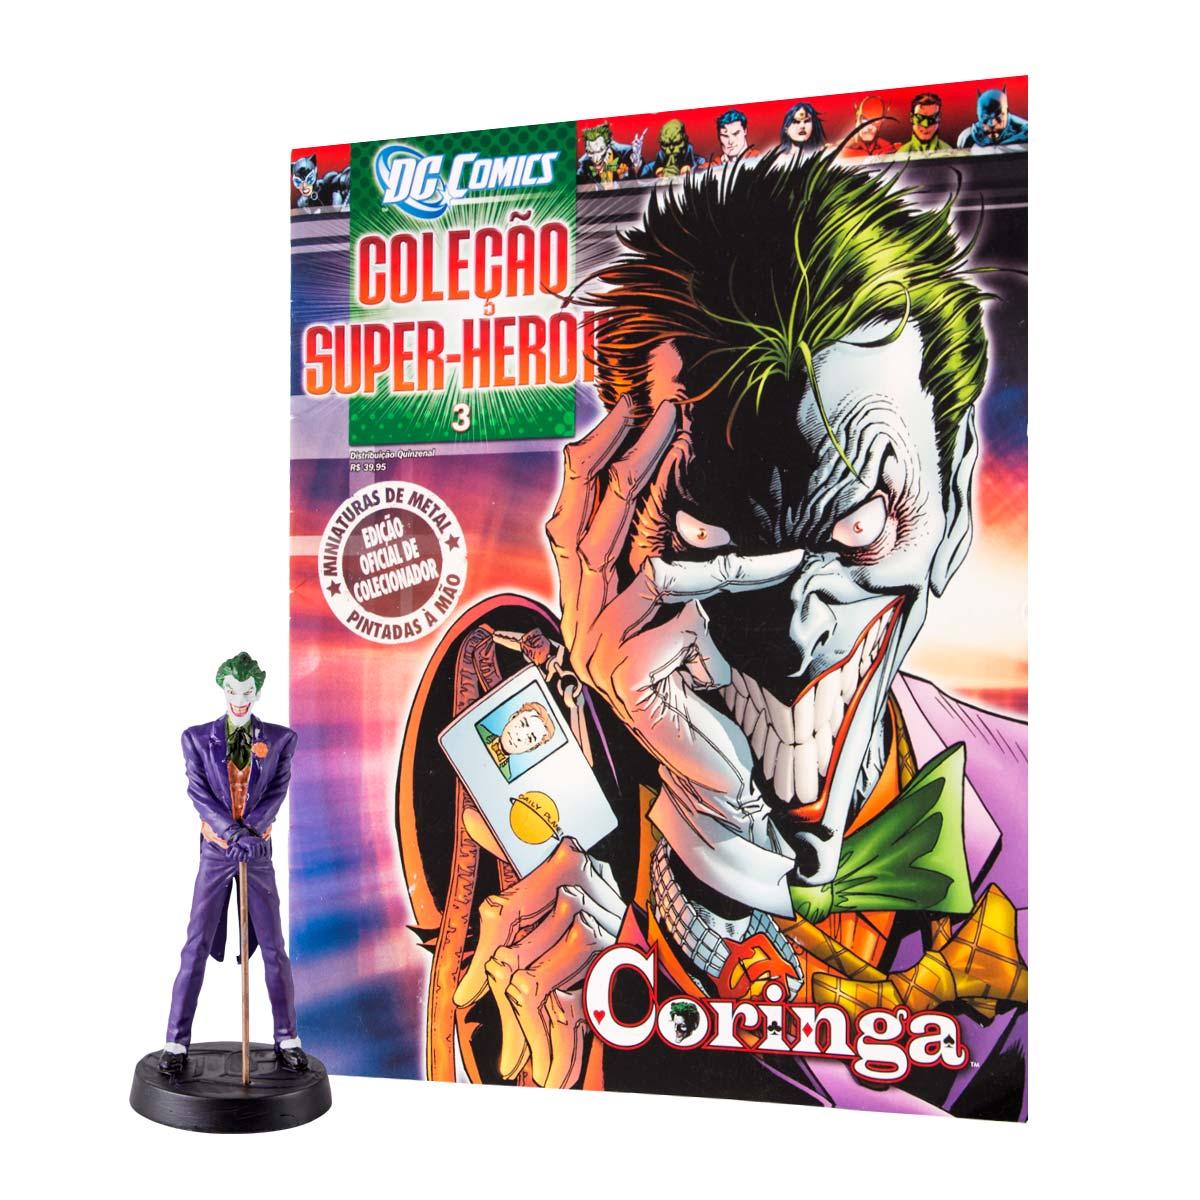 Boneco Miniatura Coringa + Revista